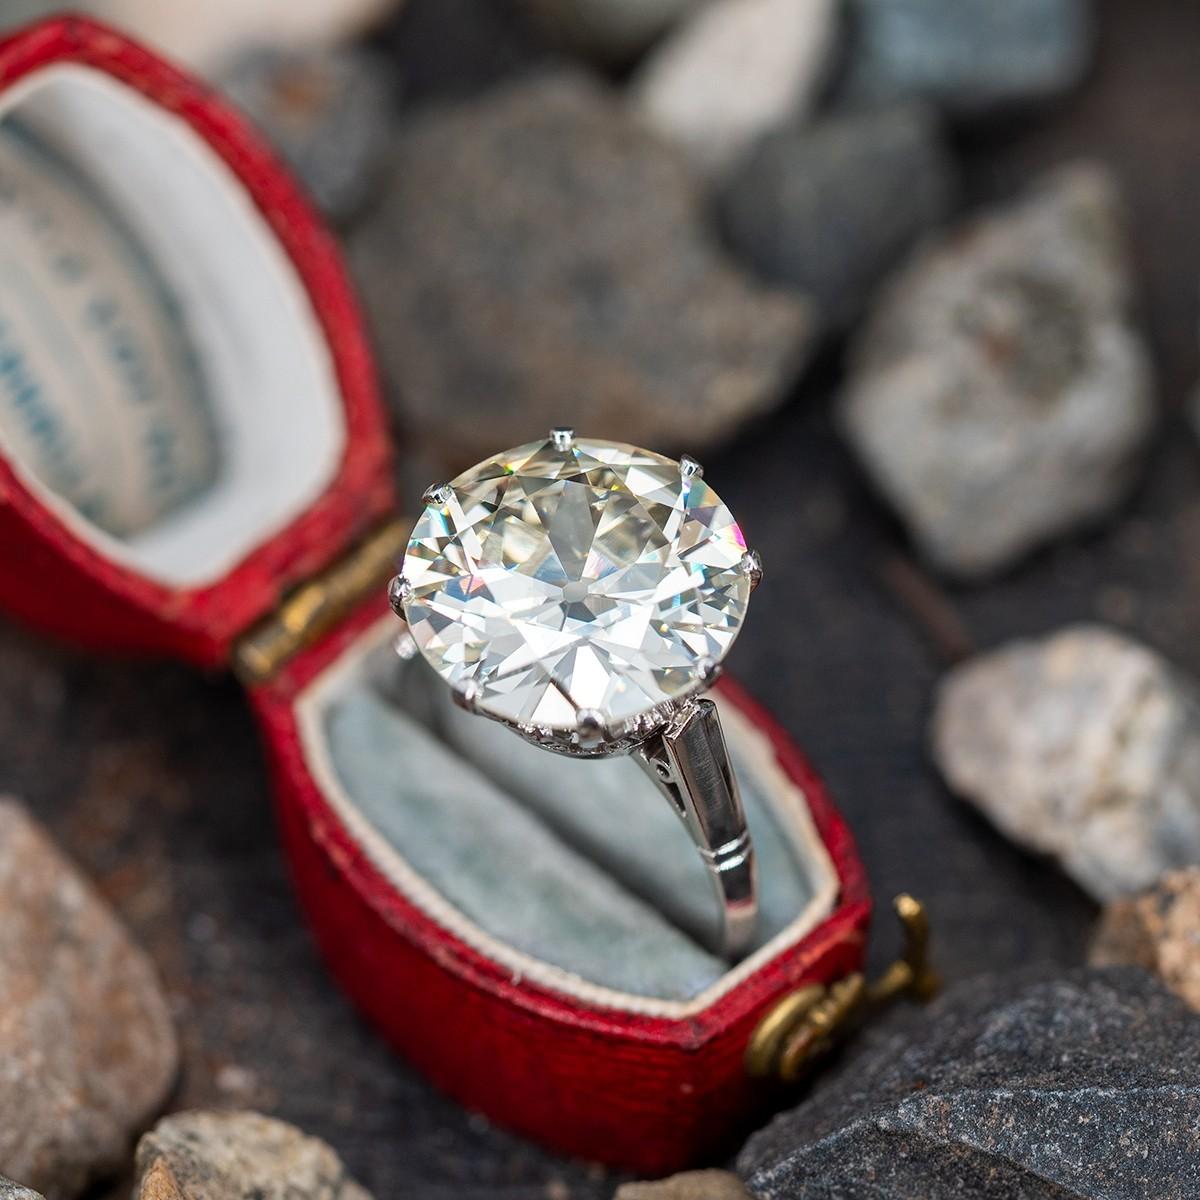 Magnificent 8 Carat Old European Cut Diamond Engagement Ring